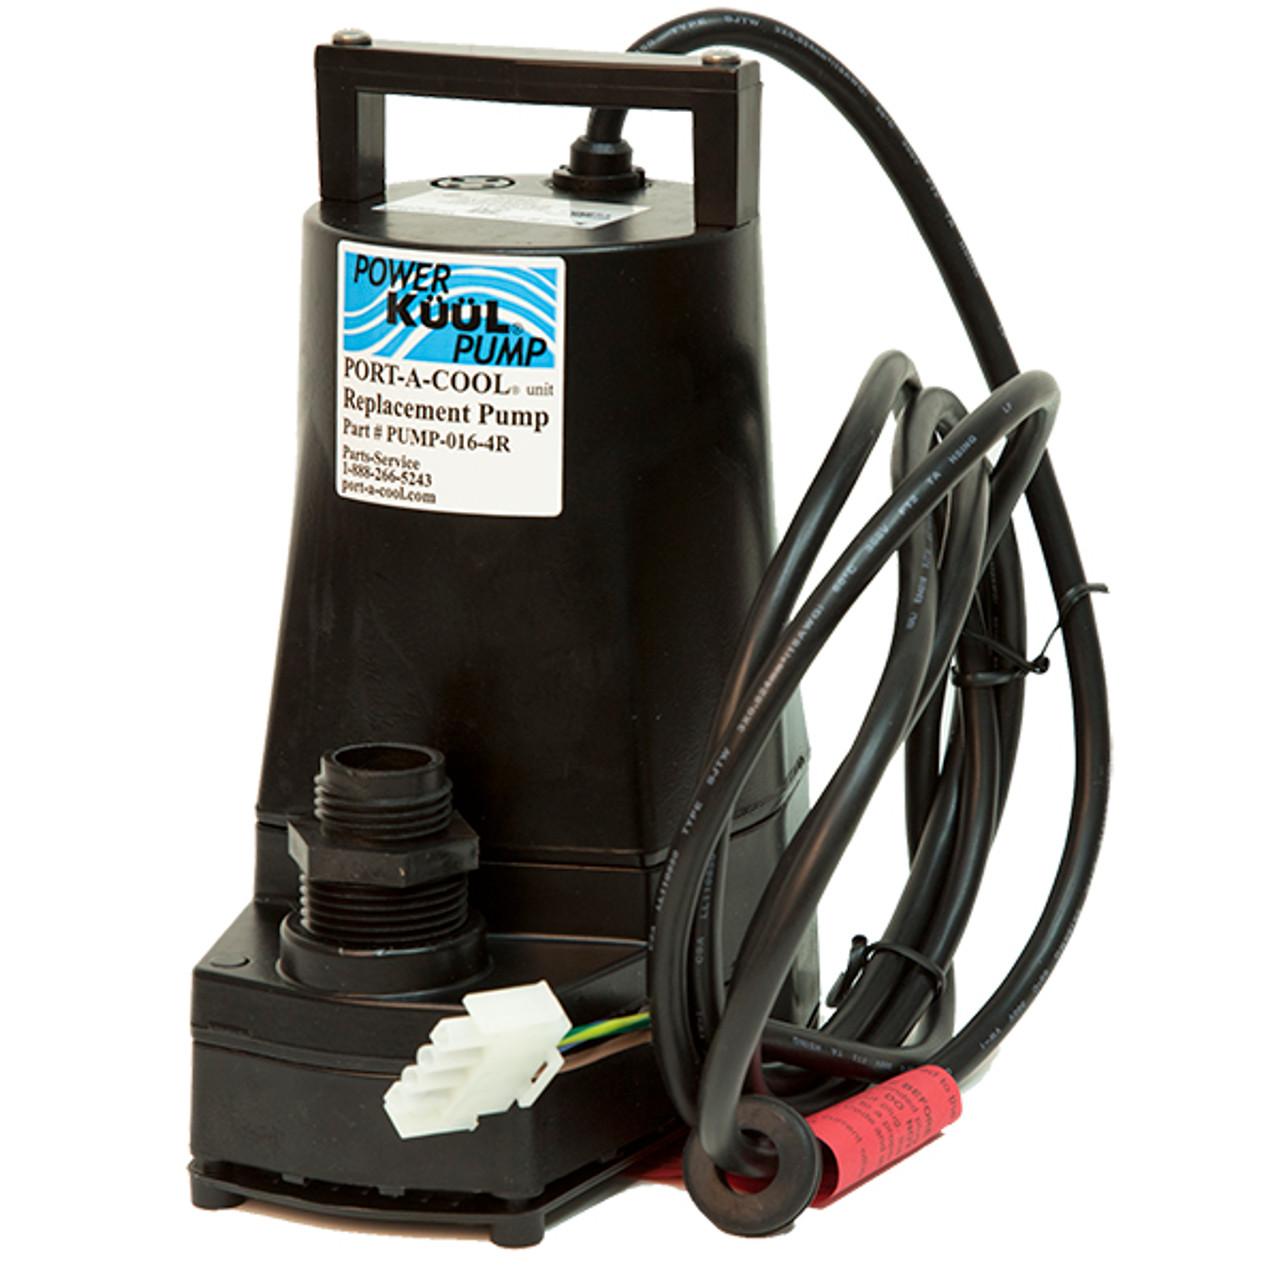 Port-a-Cool Pump PUMP-016-4R - For Portacool units with 24